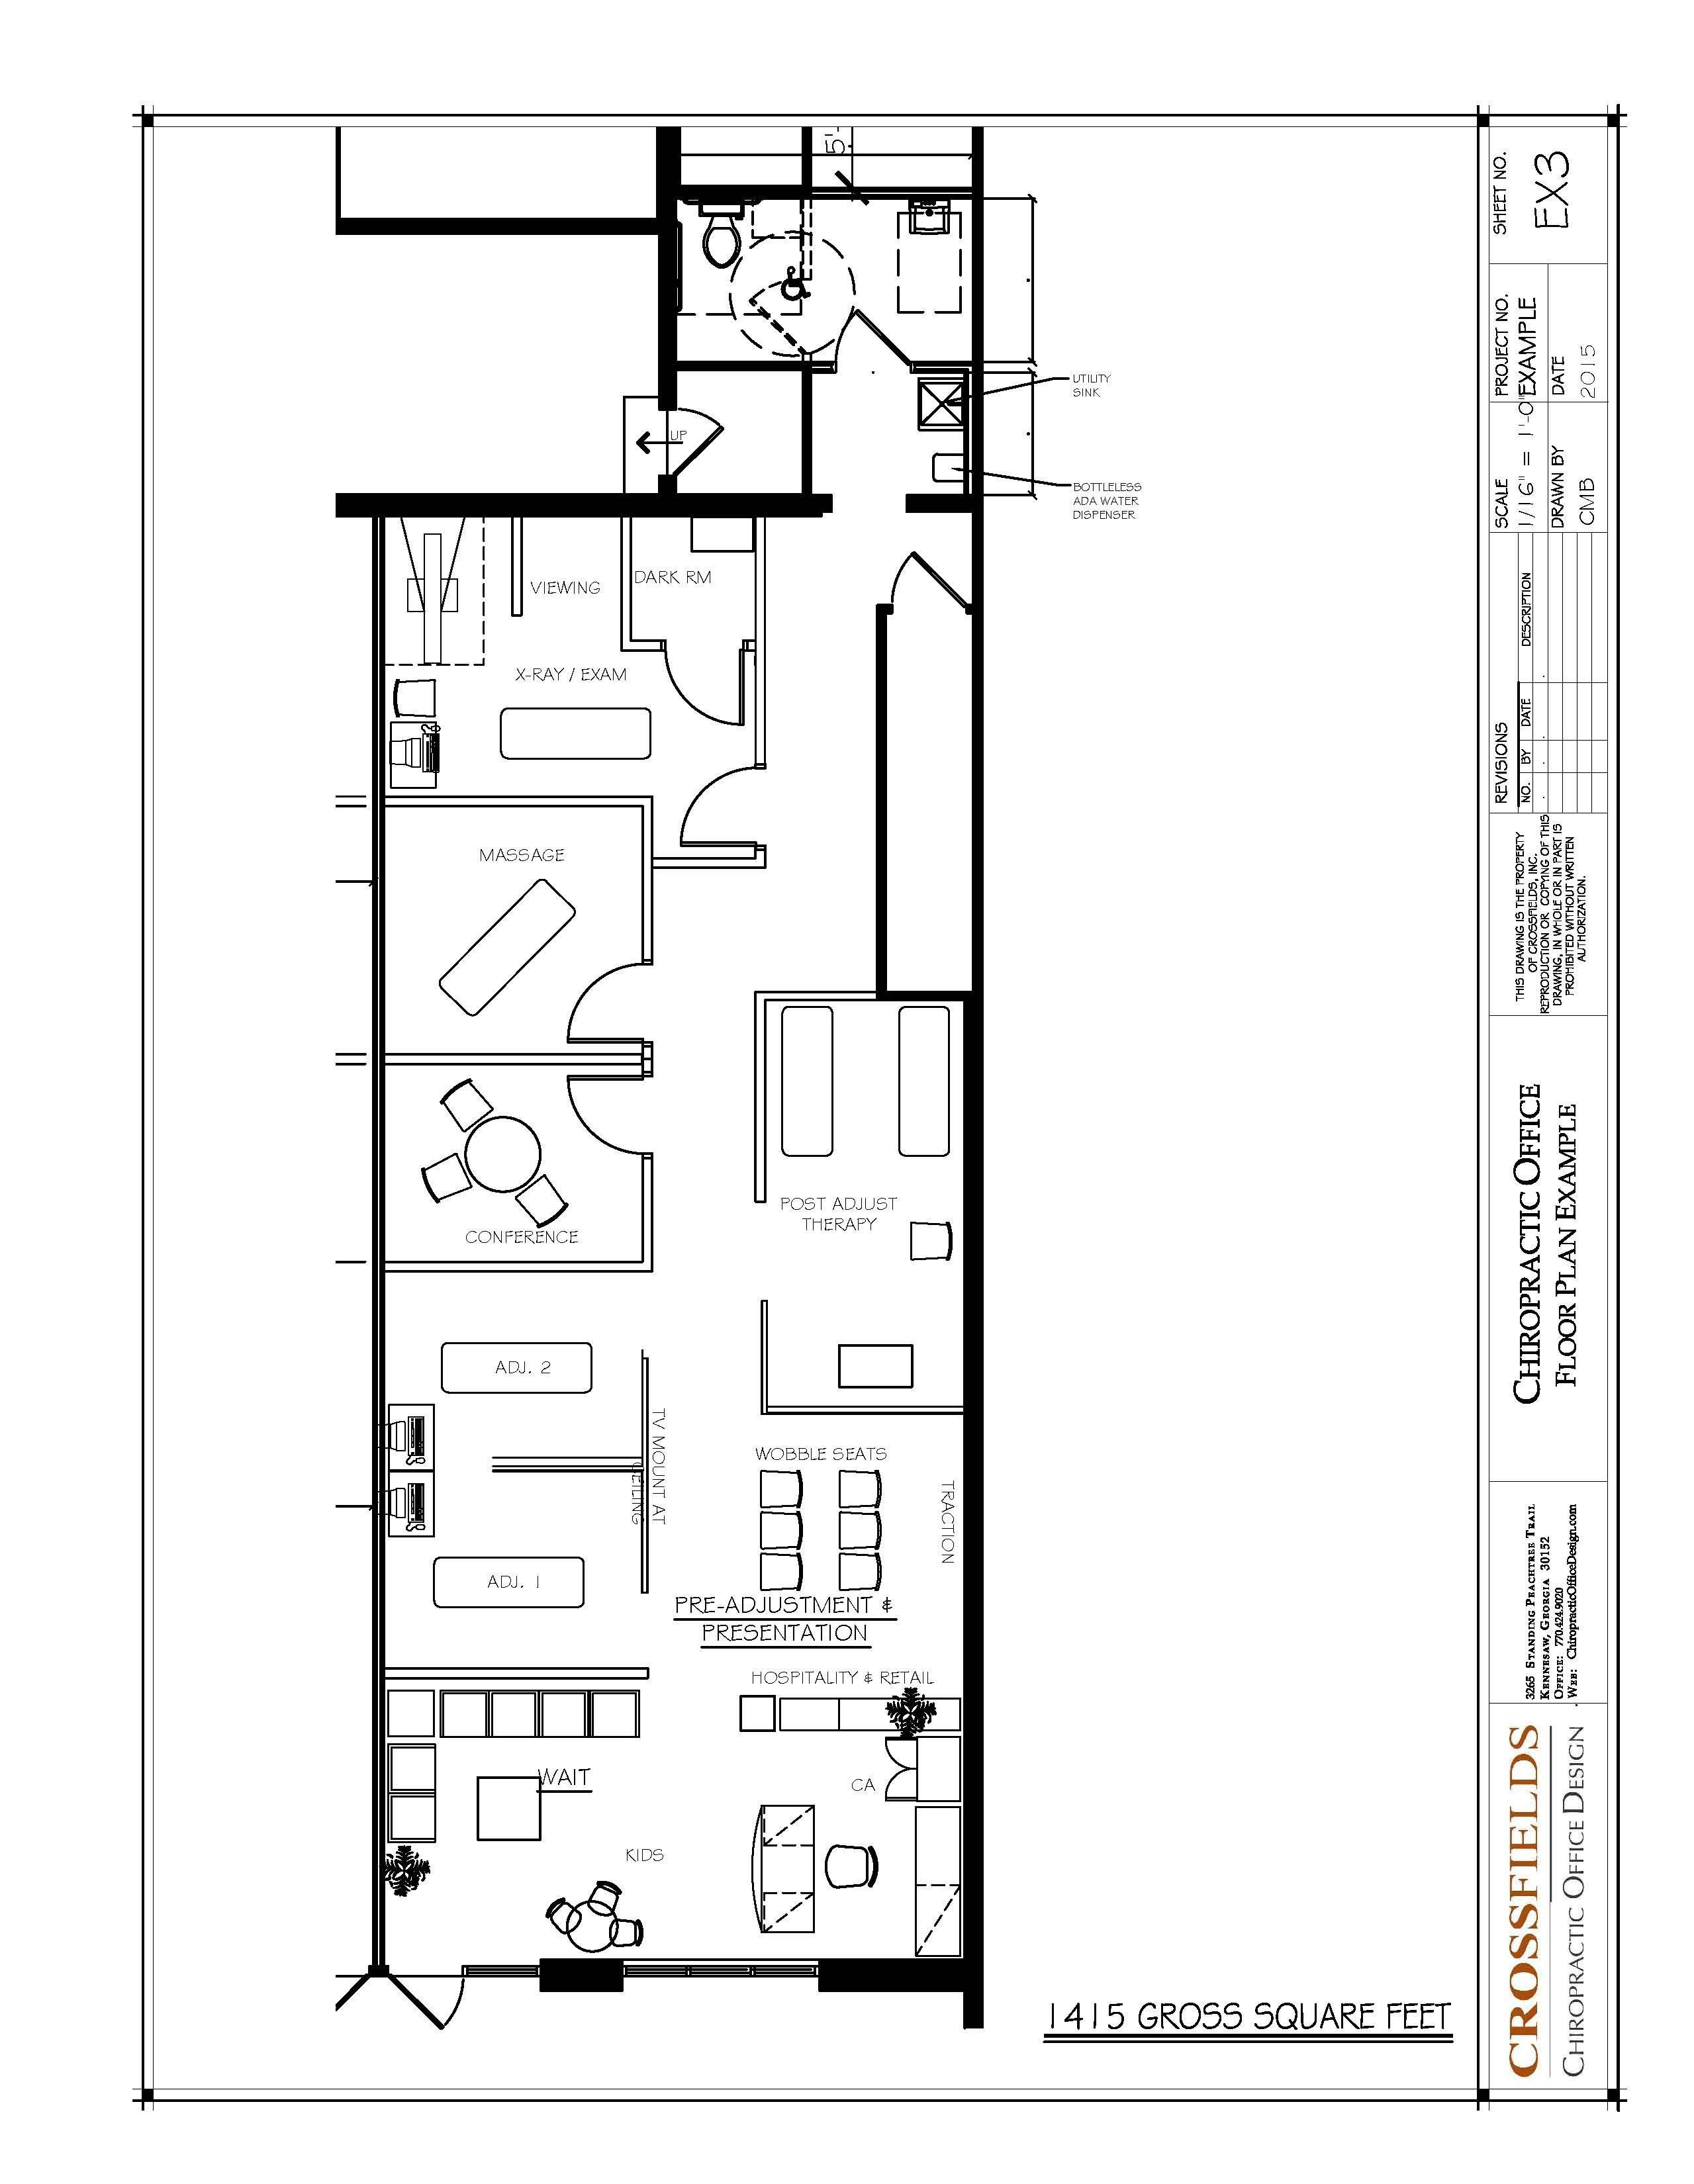 Pin by crossfields chiropractic office design on - Semi open floor plan ...